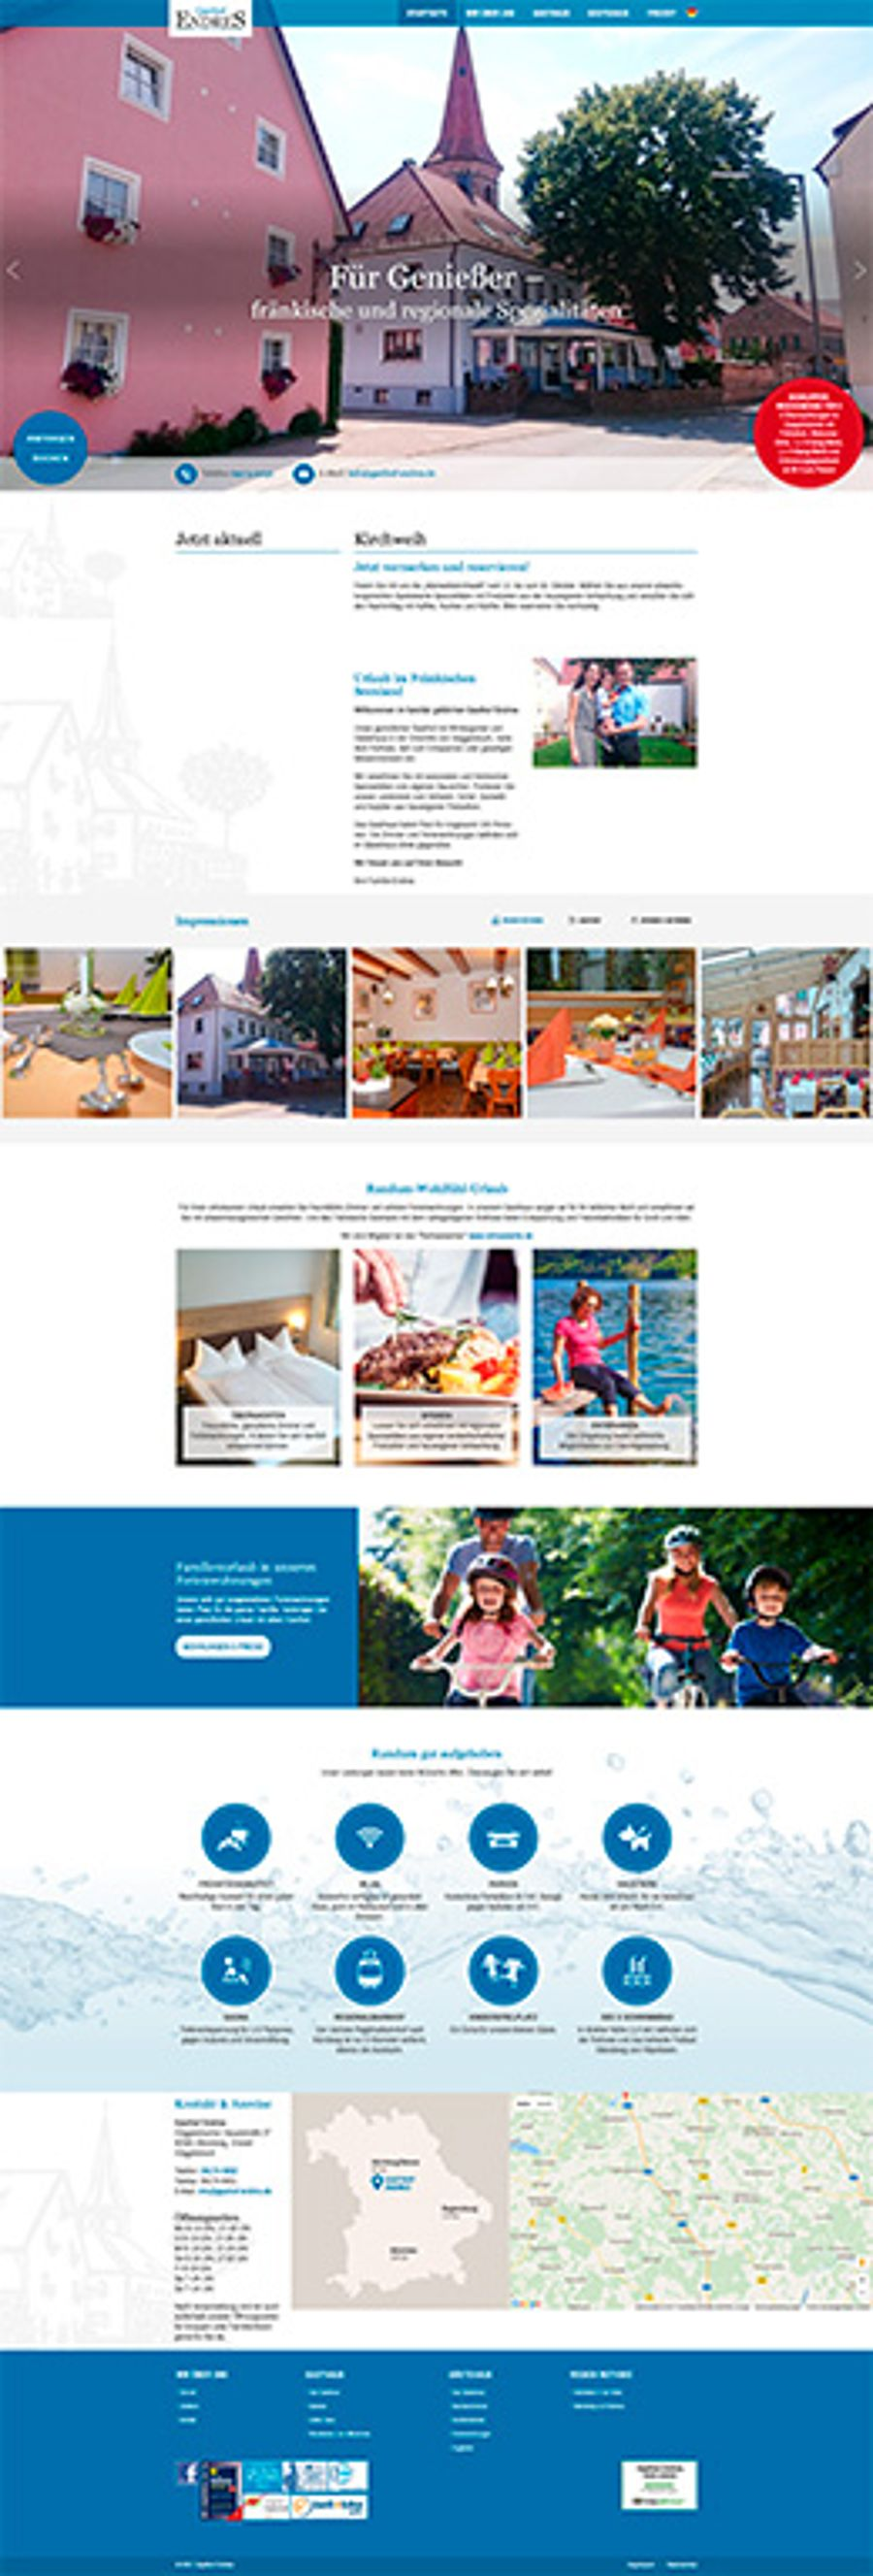 Traditionsreicher Gasthof modern im Web